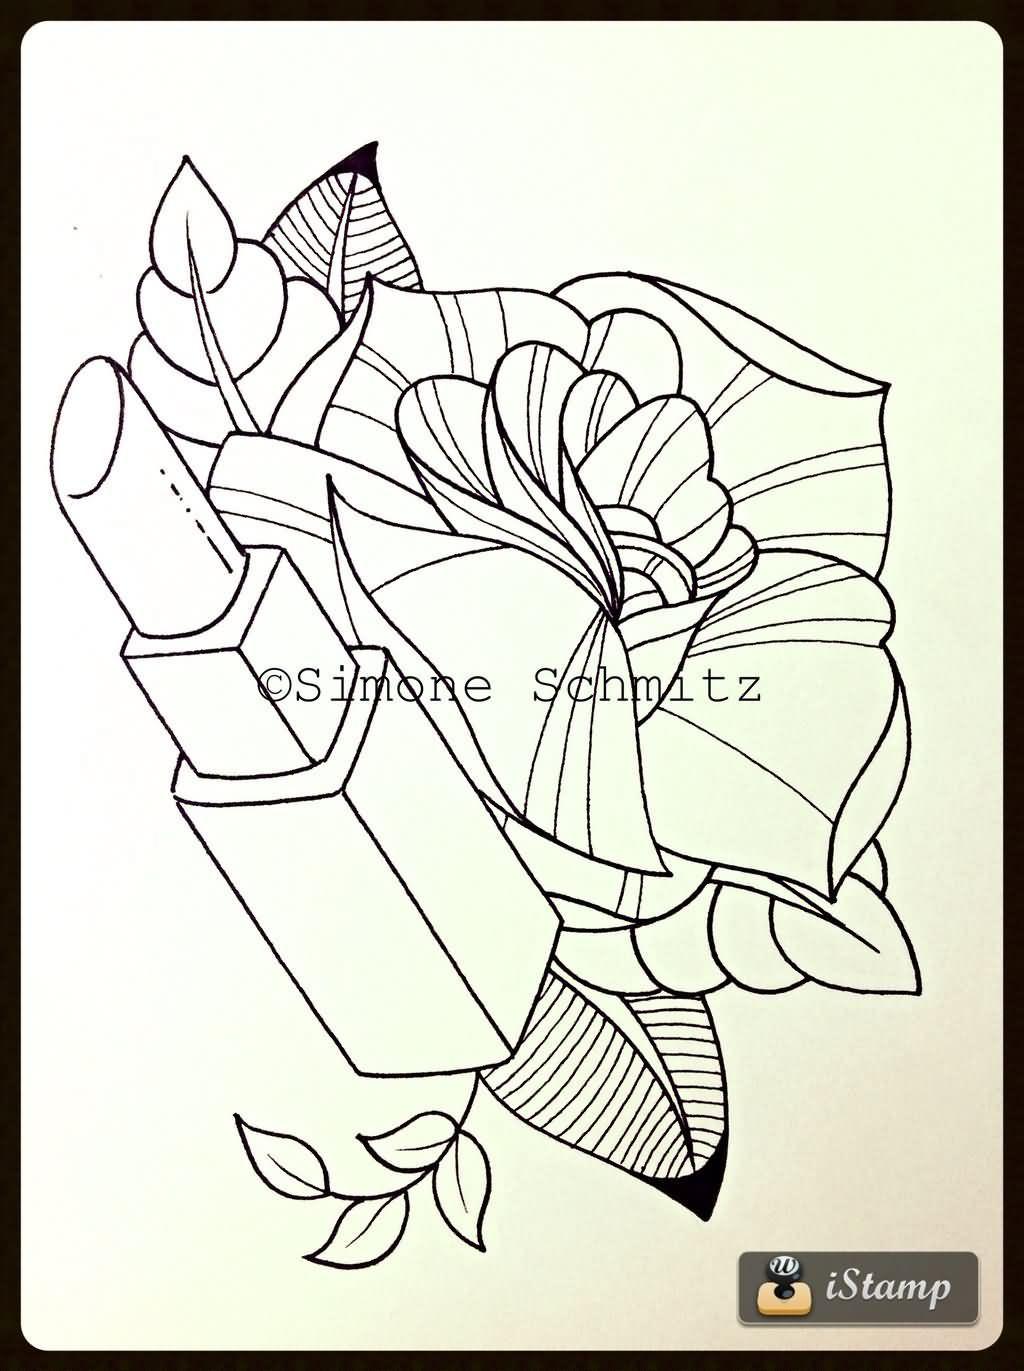 Pin by rachael long on tattoo ideas/drawings | Lipstick tattoos ...